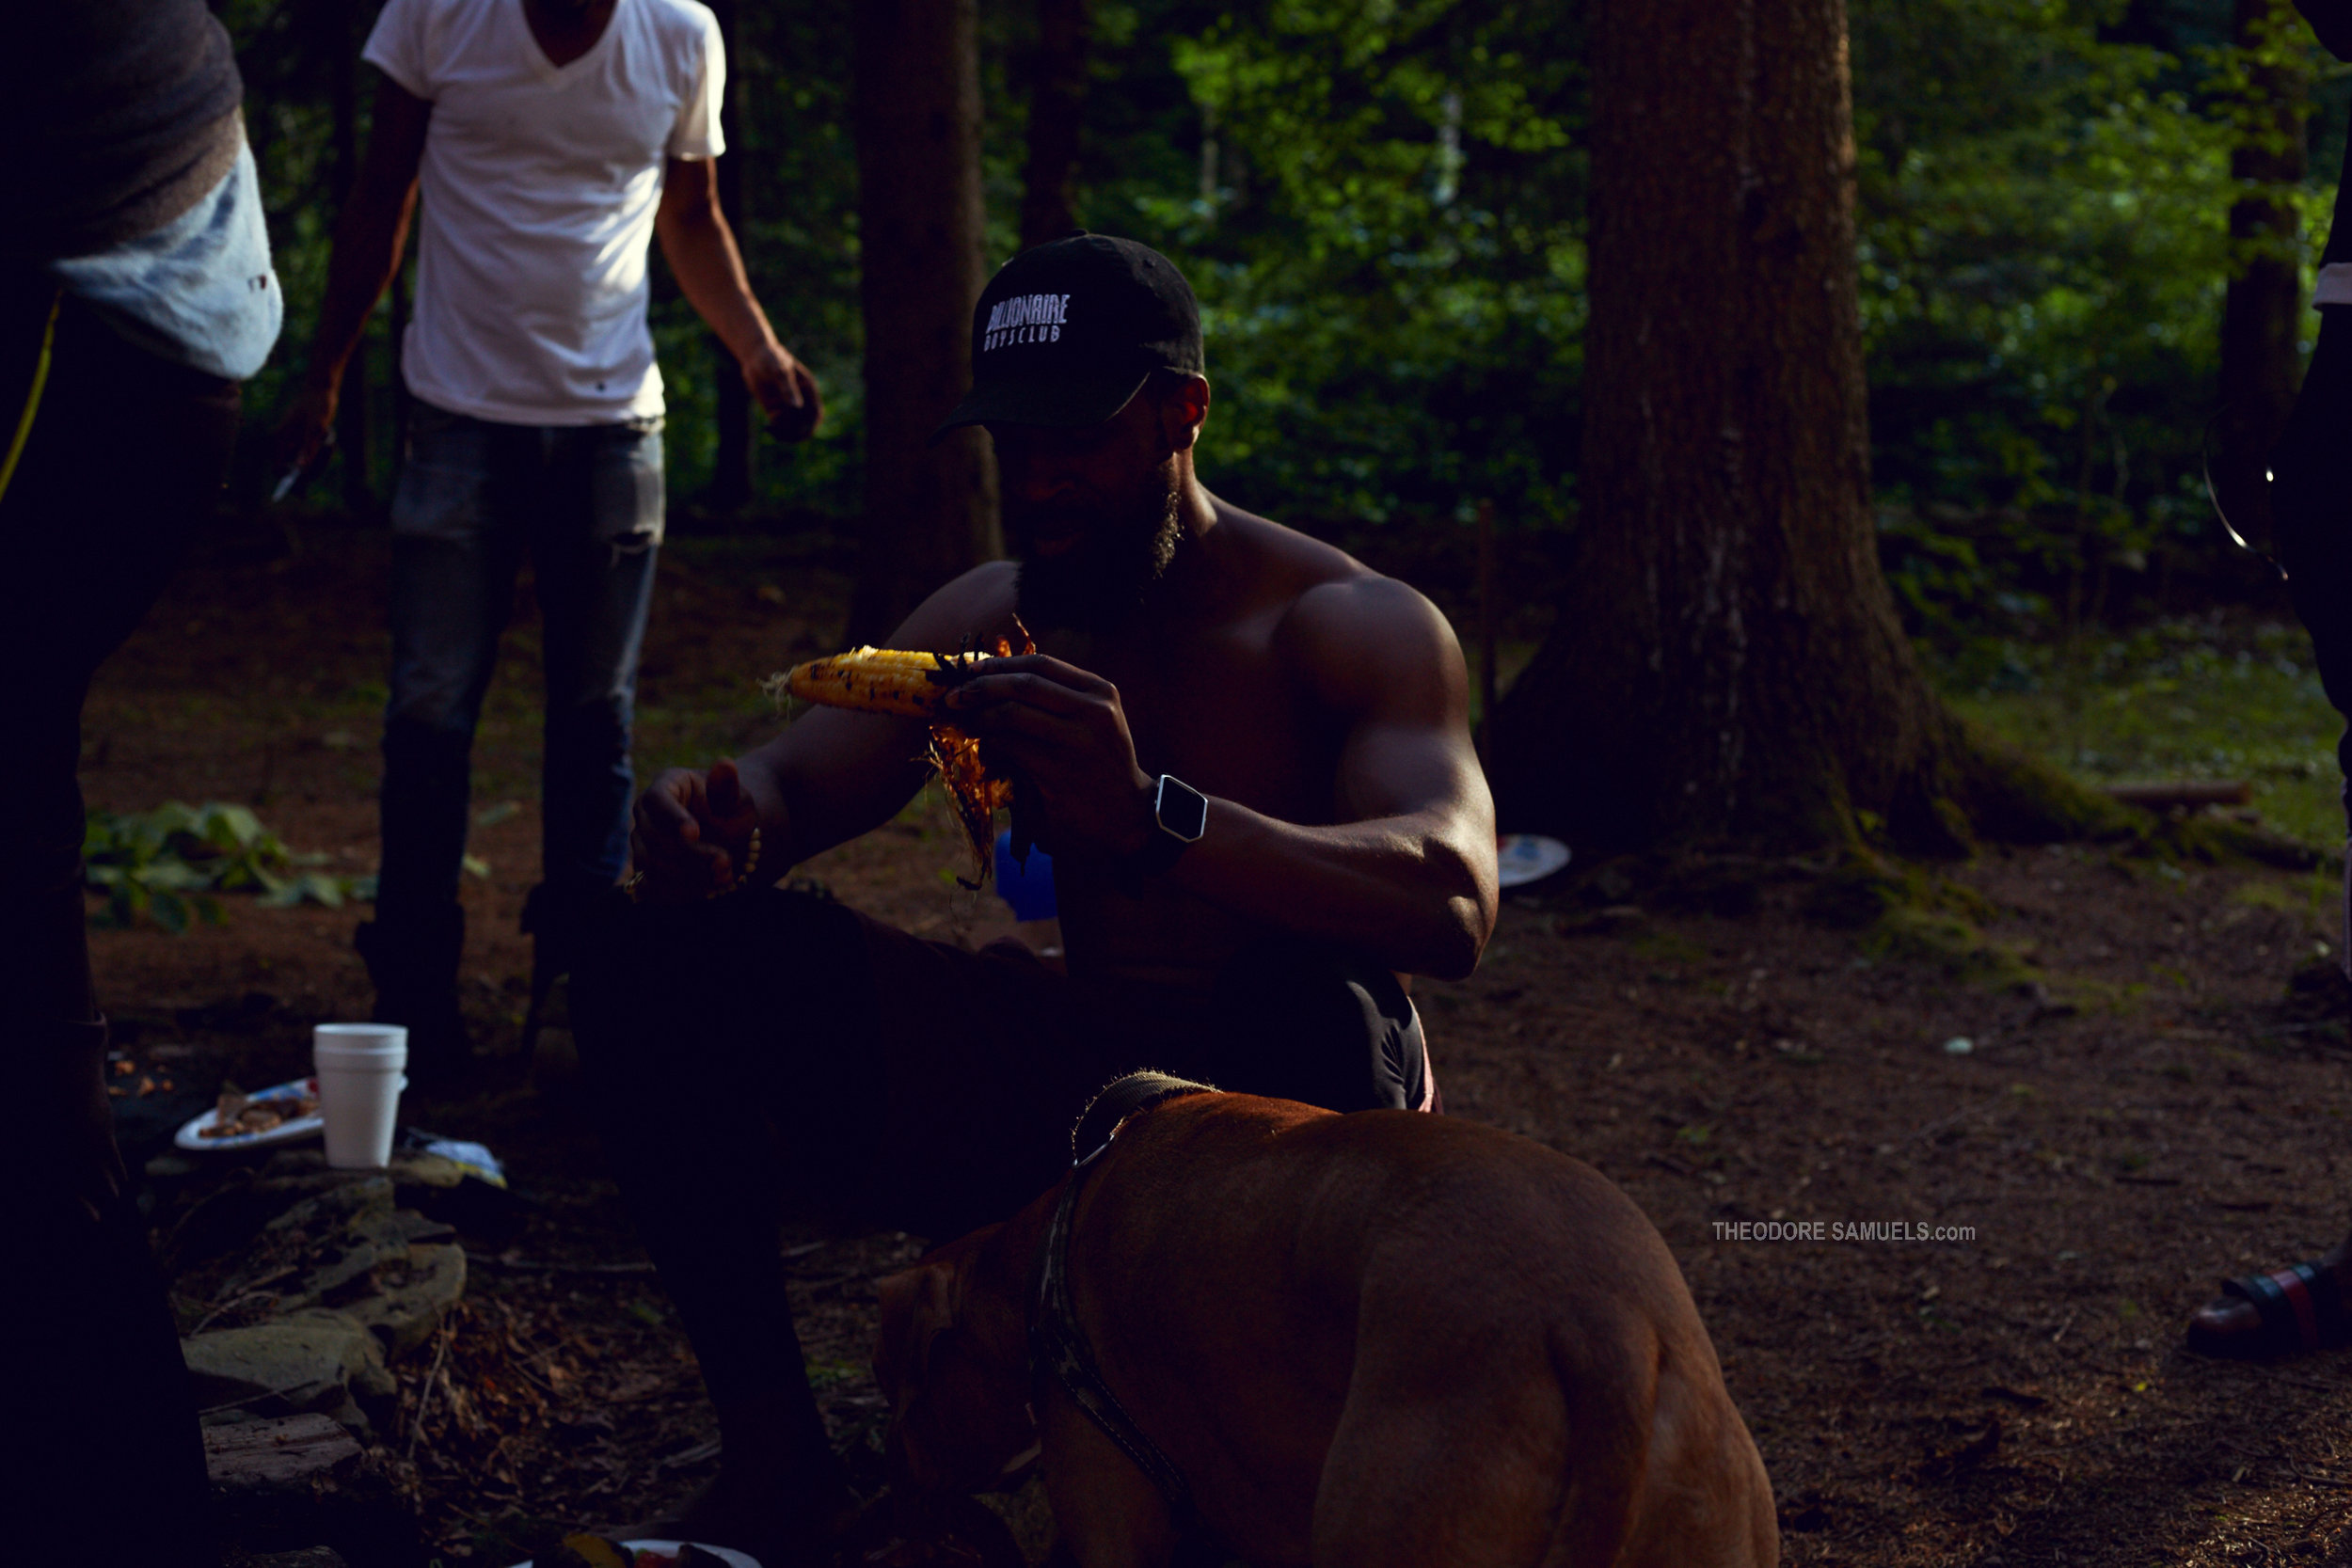 170625_Mastermind Camping_174.jpg